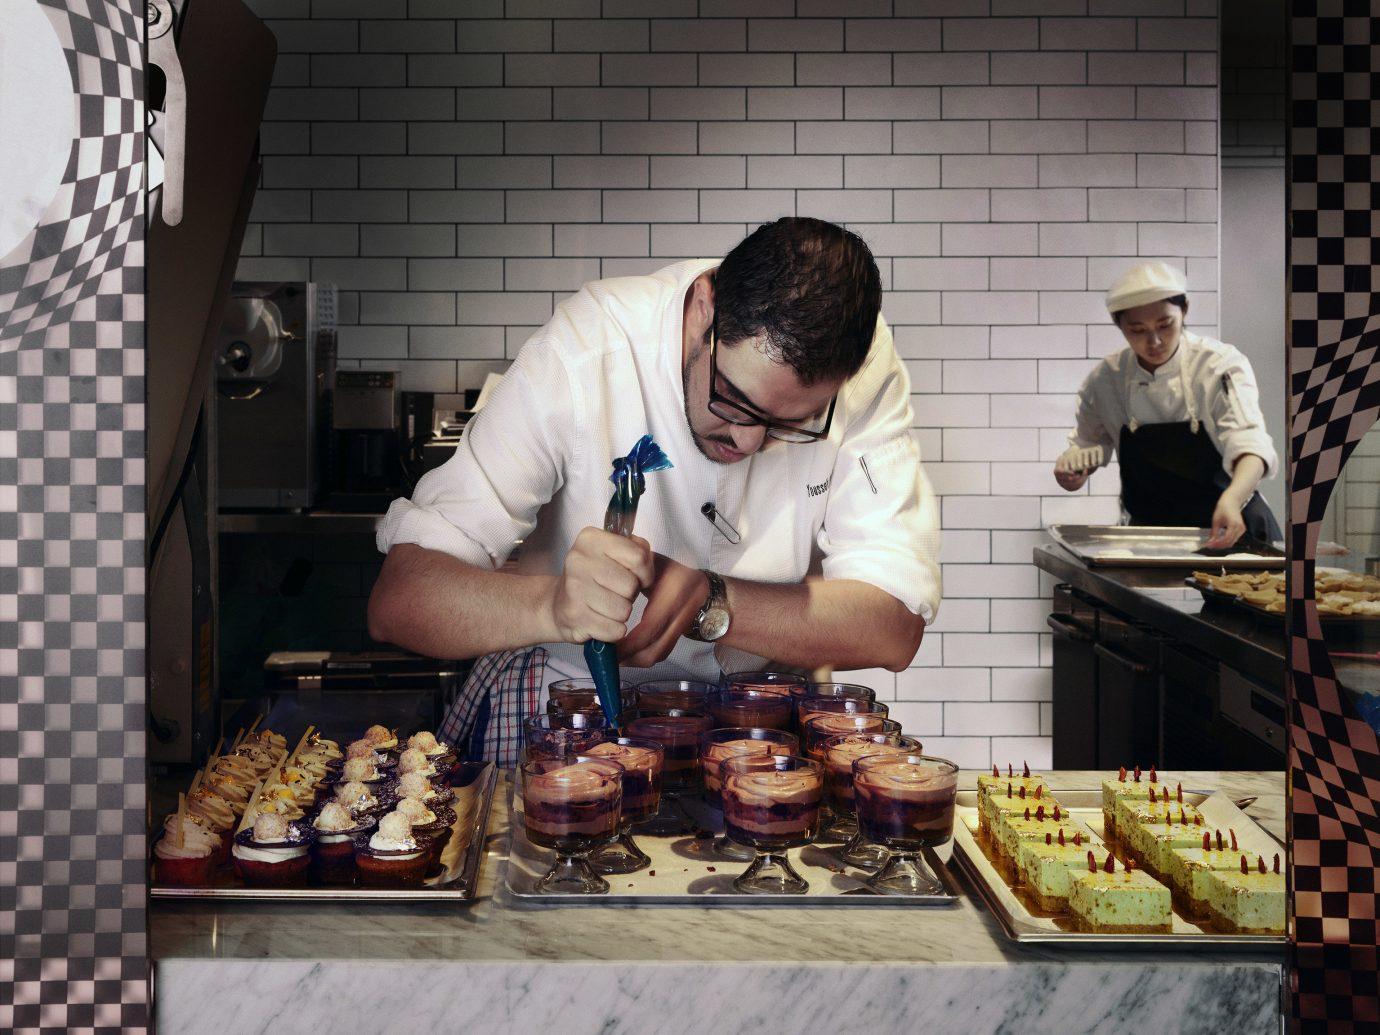 Hotels Romance person indoor food dish meal sense cuisine street food preparing